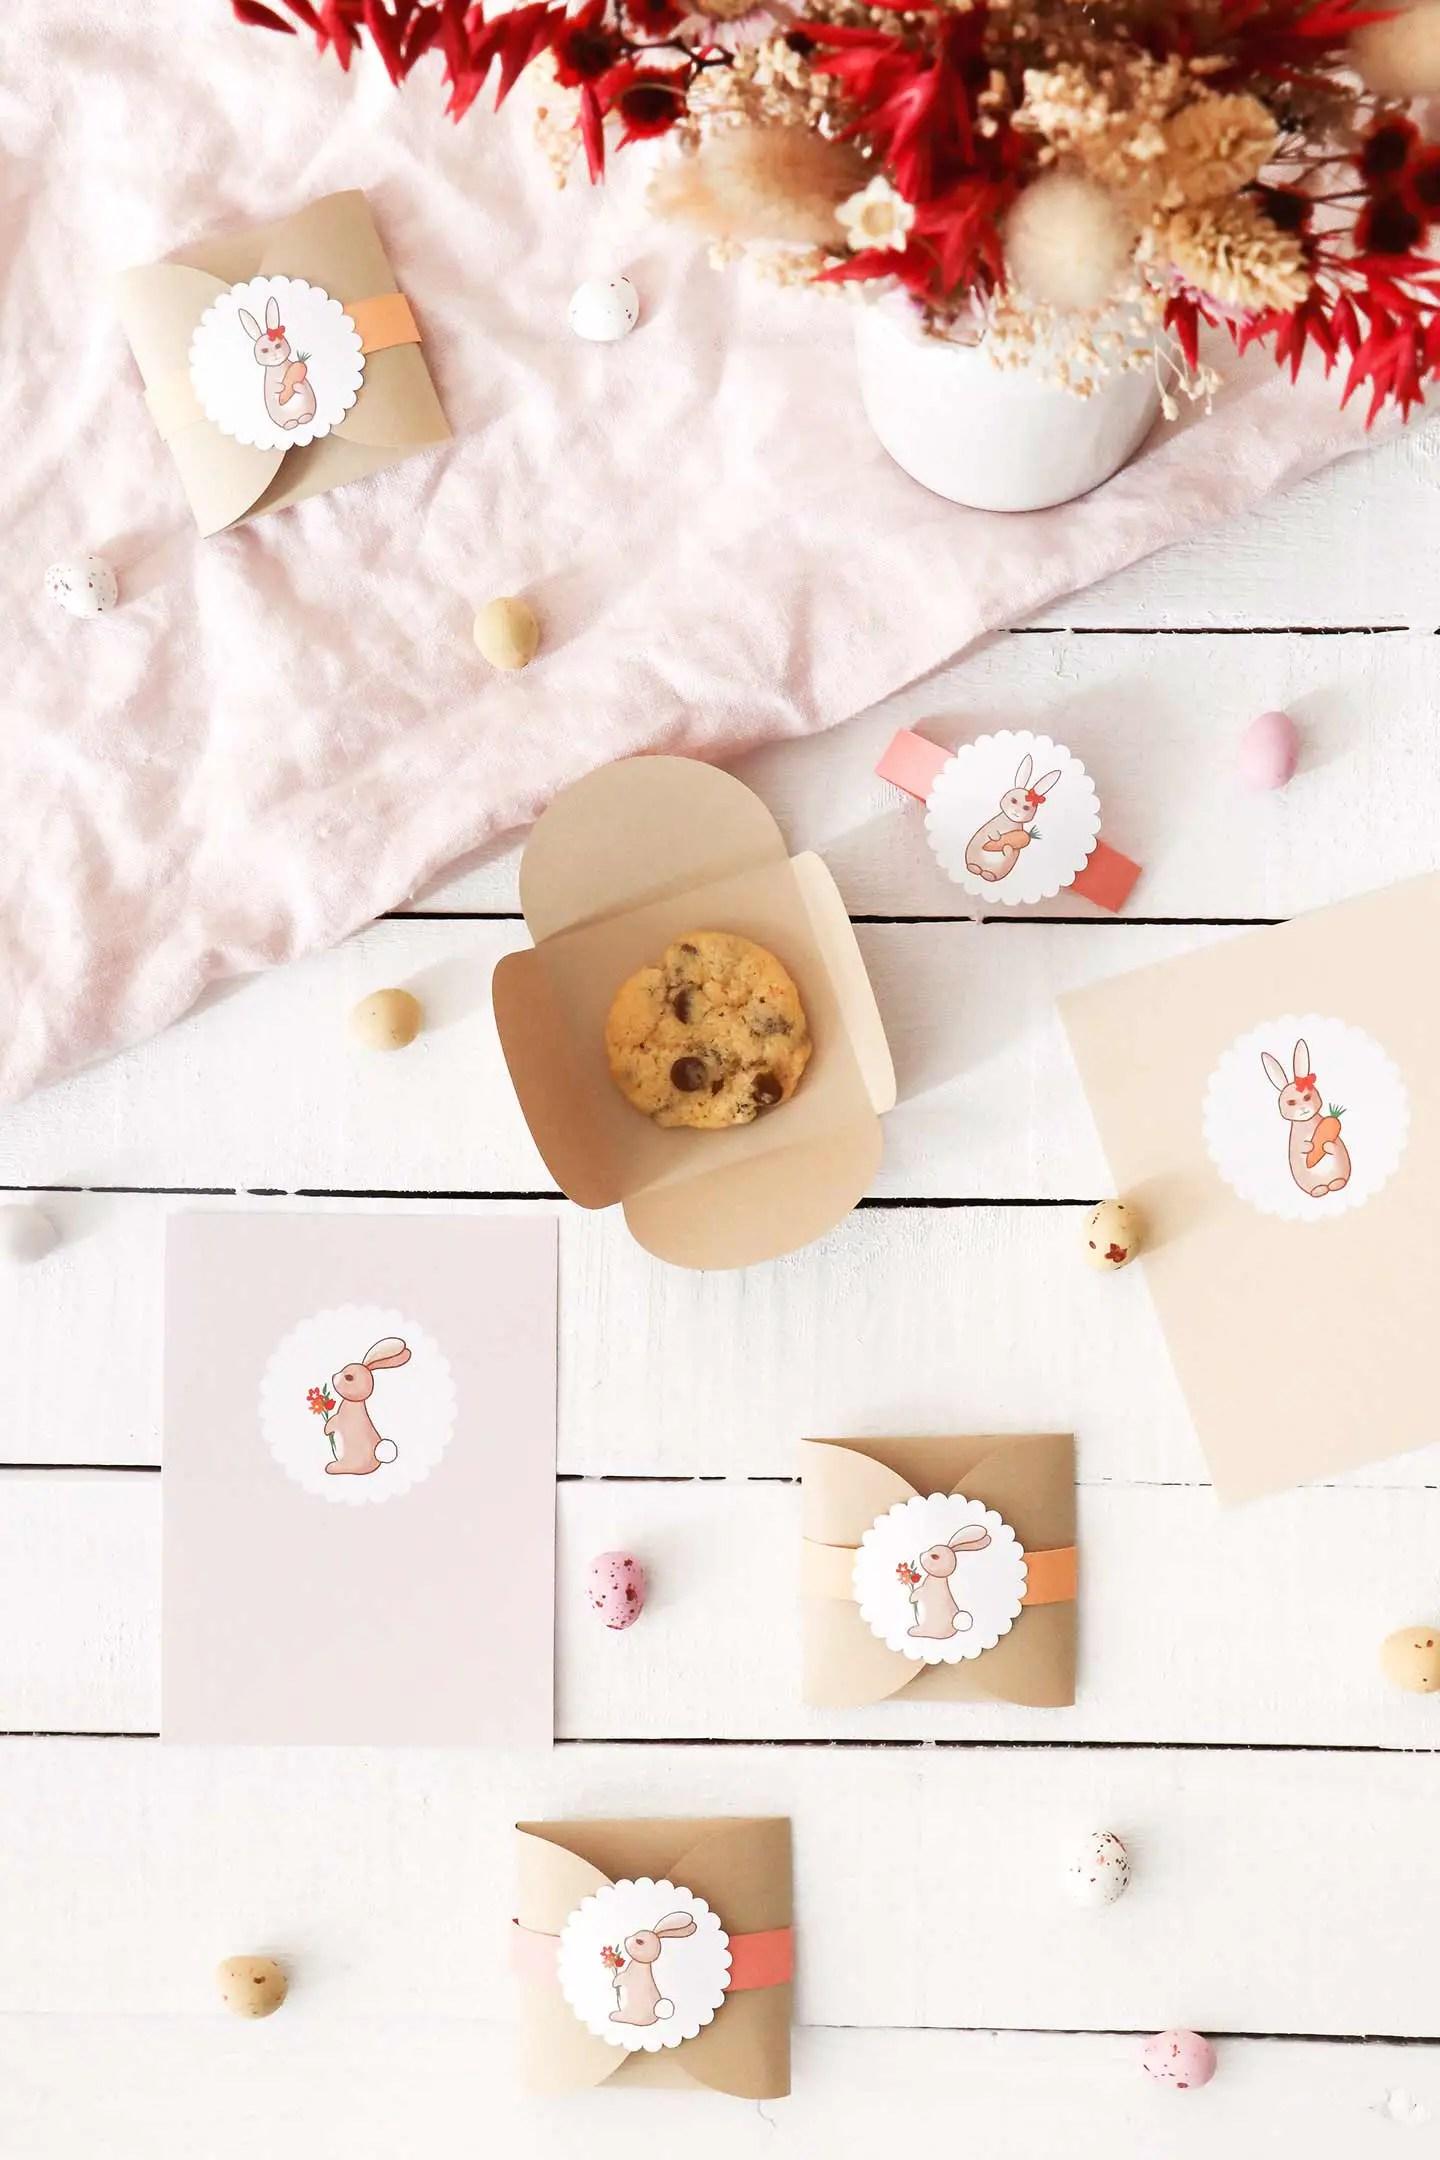 Tuto sachets biscuits Pâques